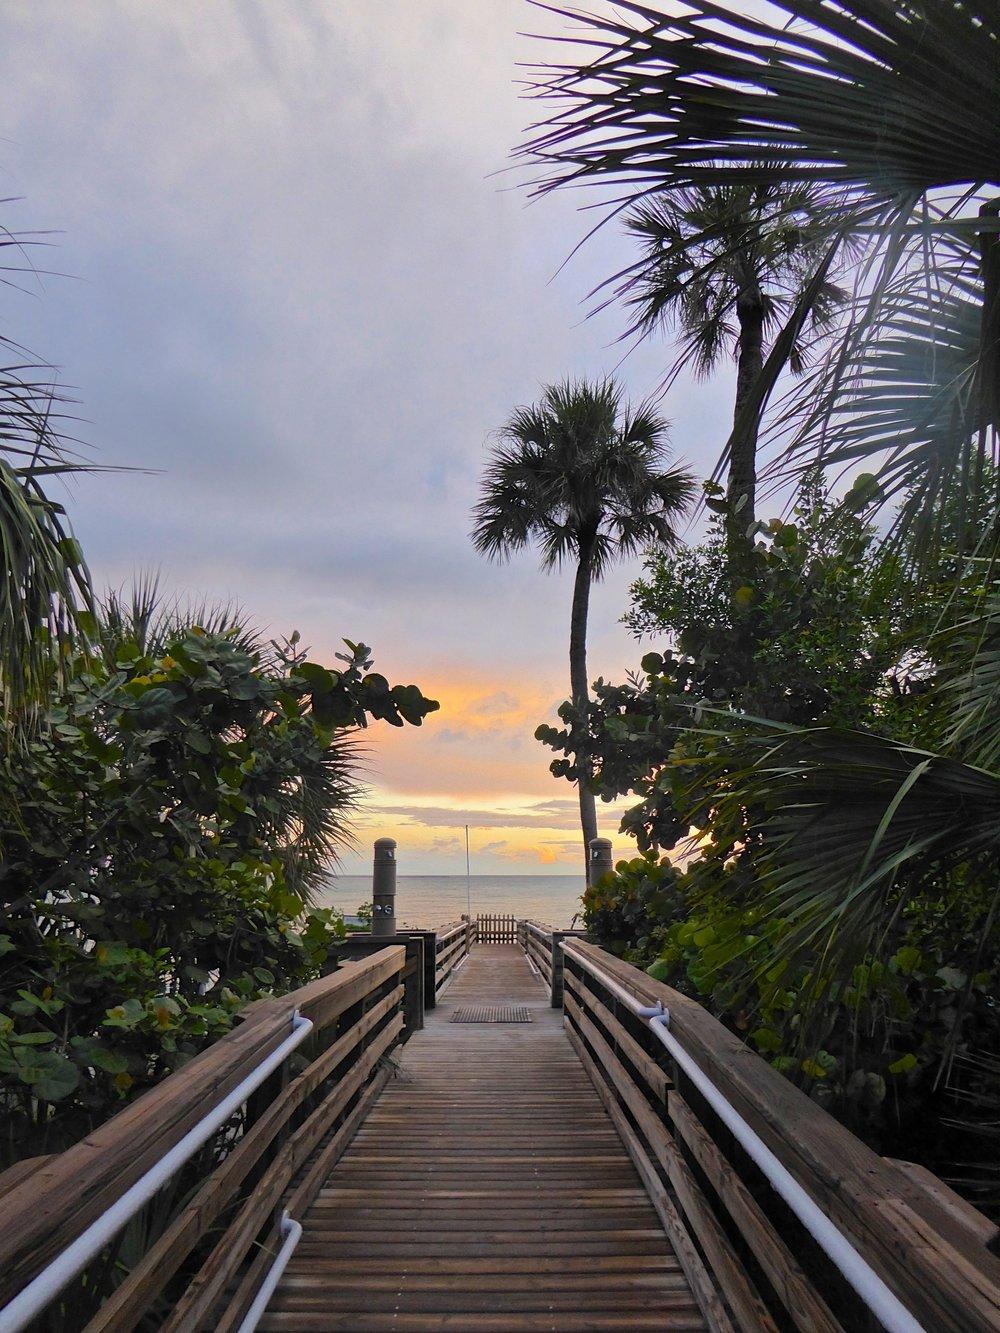 cindi_walkway_pier_sunset_longboatkey_beach_spiritedtable_photo1.jpg